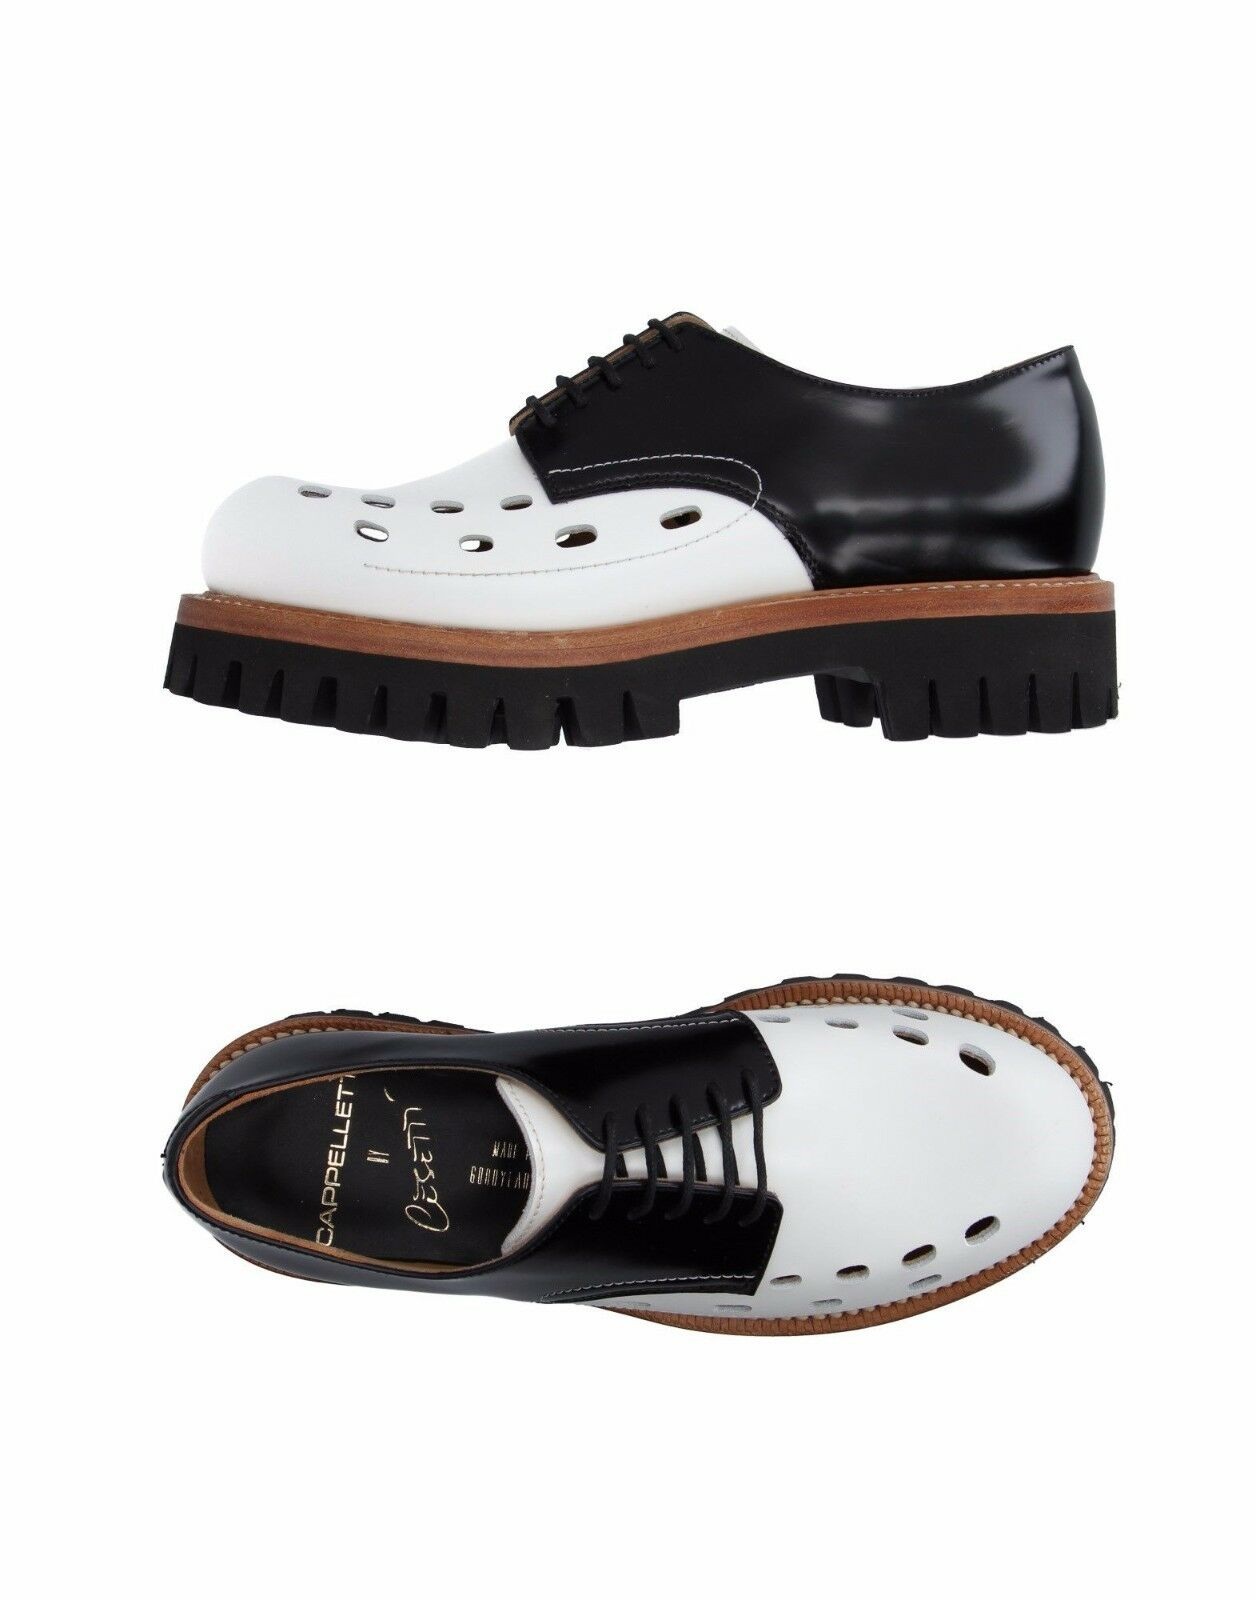 Cappelletti laceup shoes (size 41)